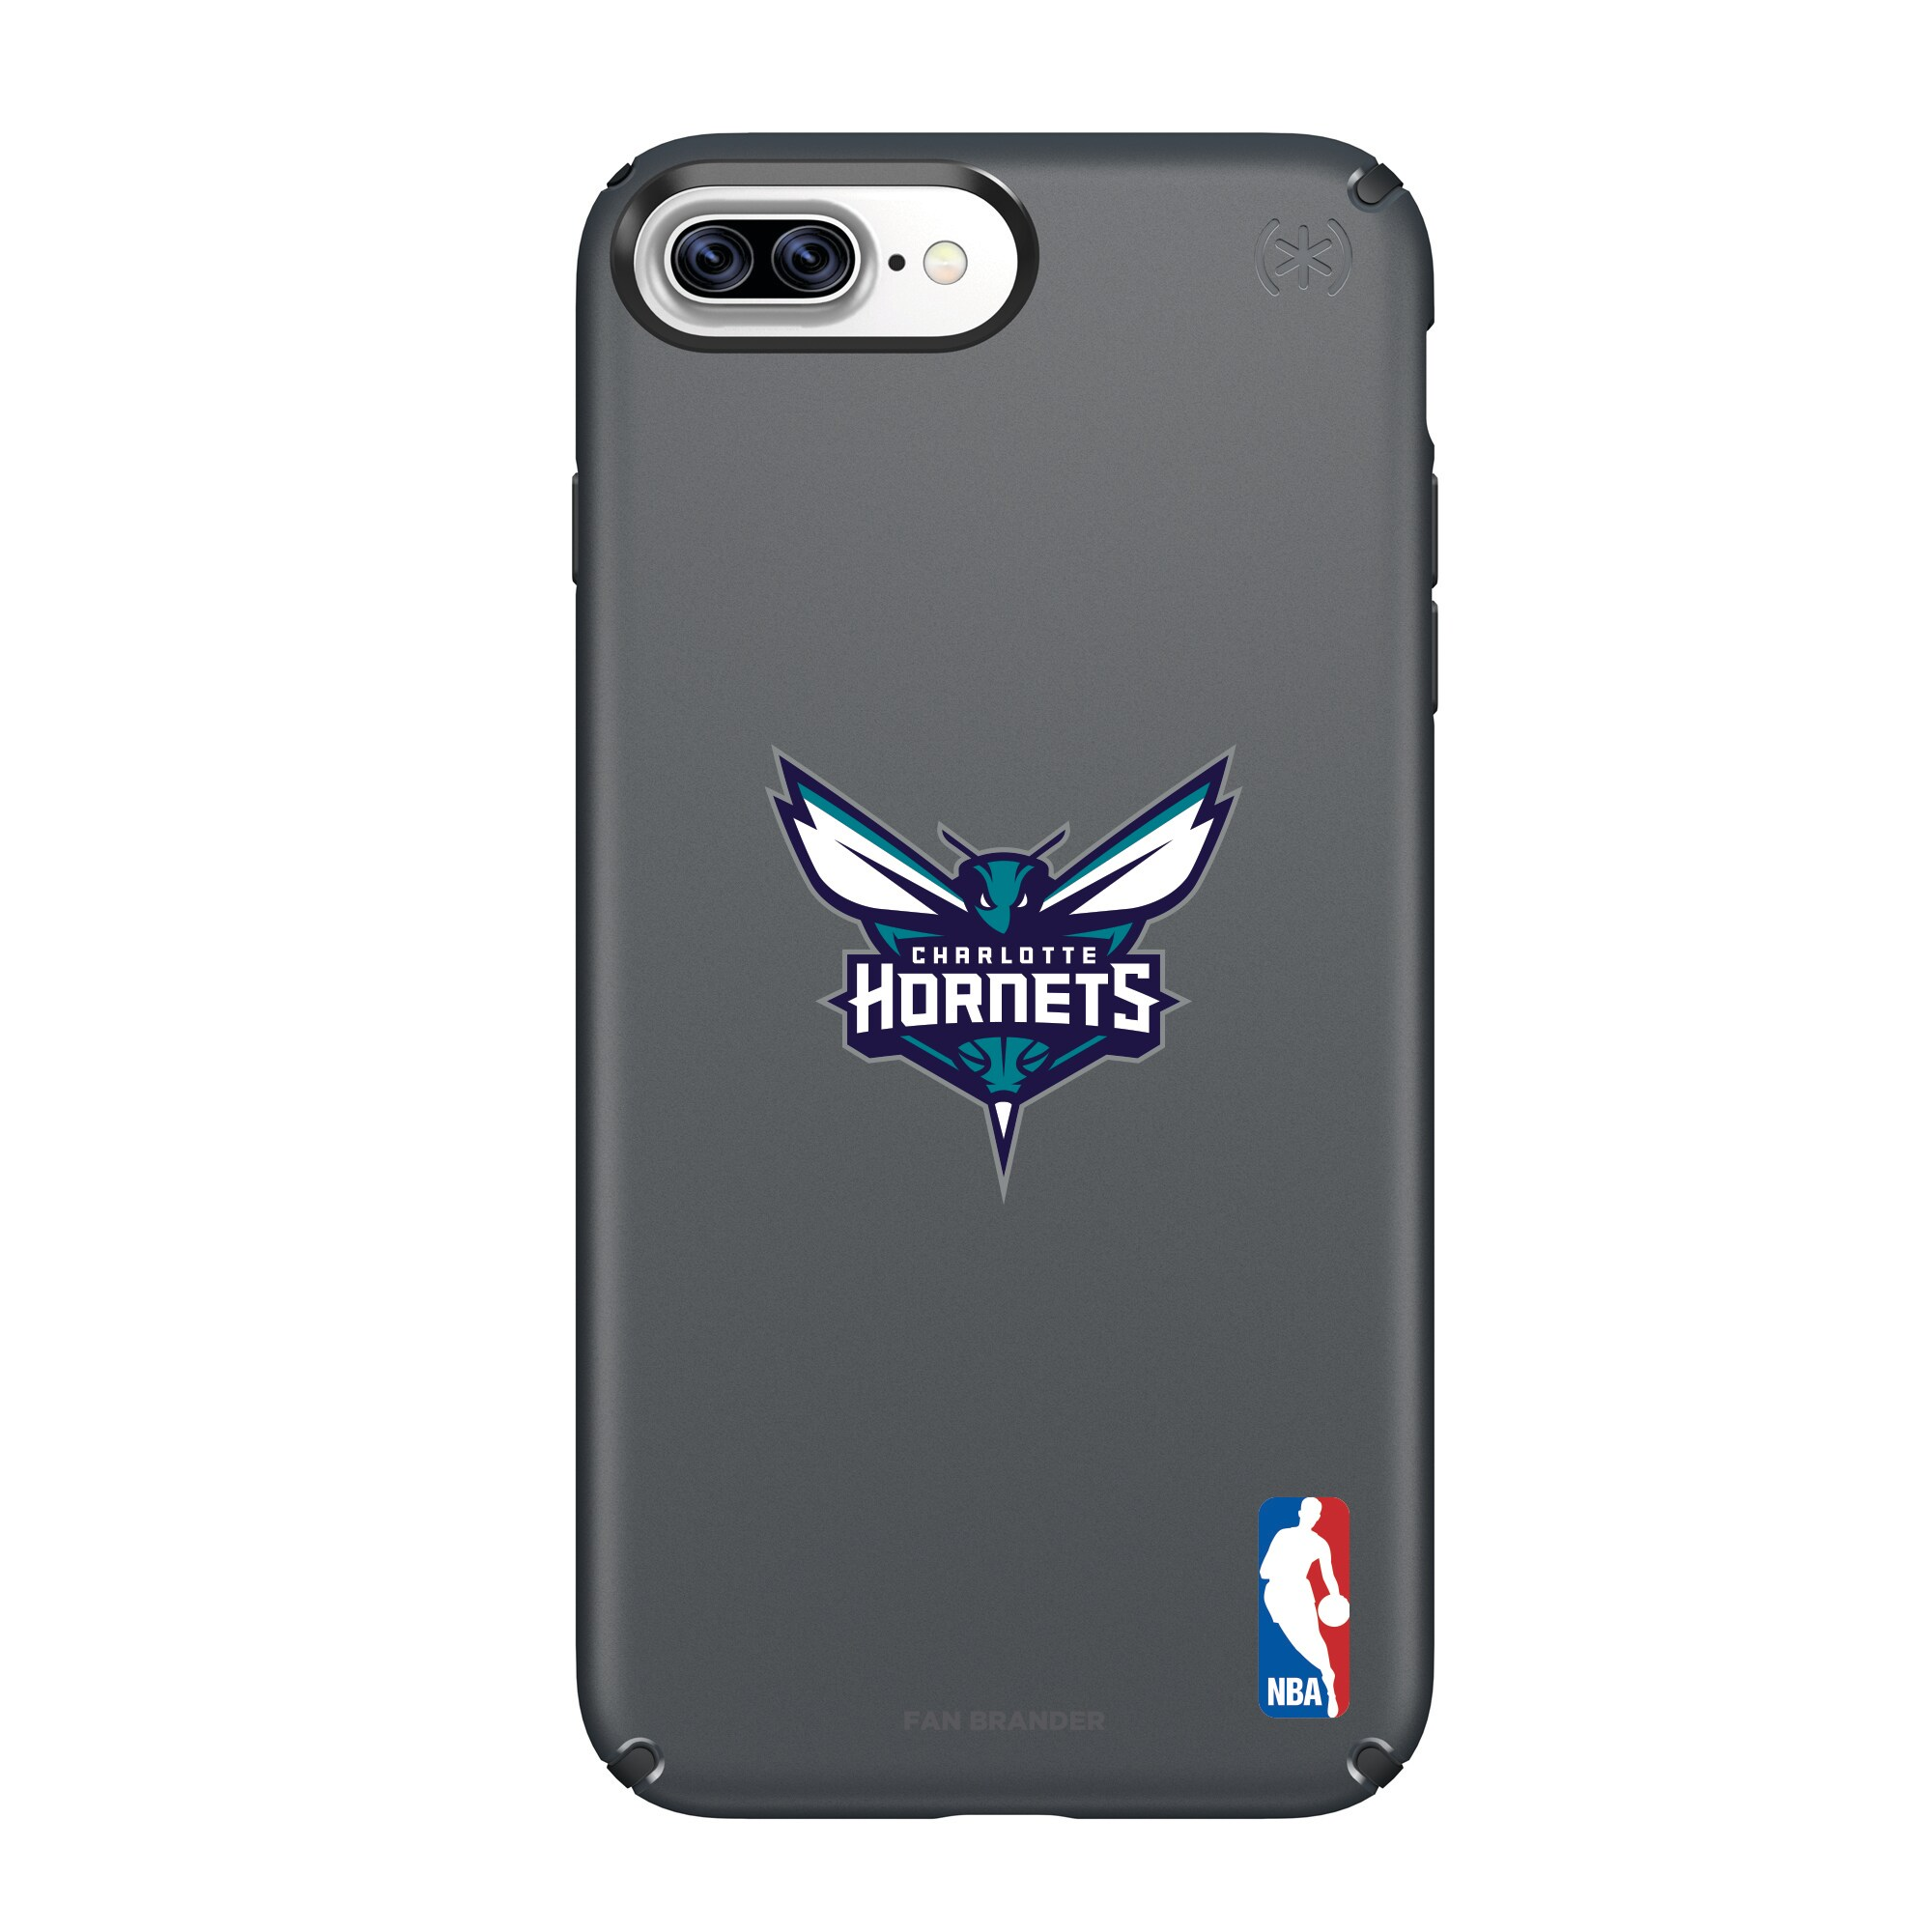 Charlotte Hornets Speck Primary Logo iPhone Case - Black